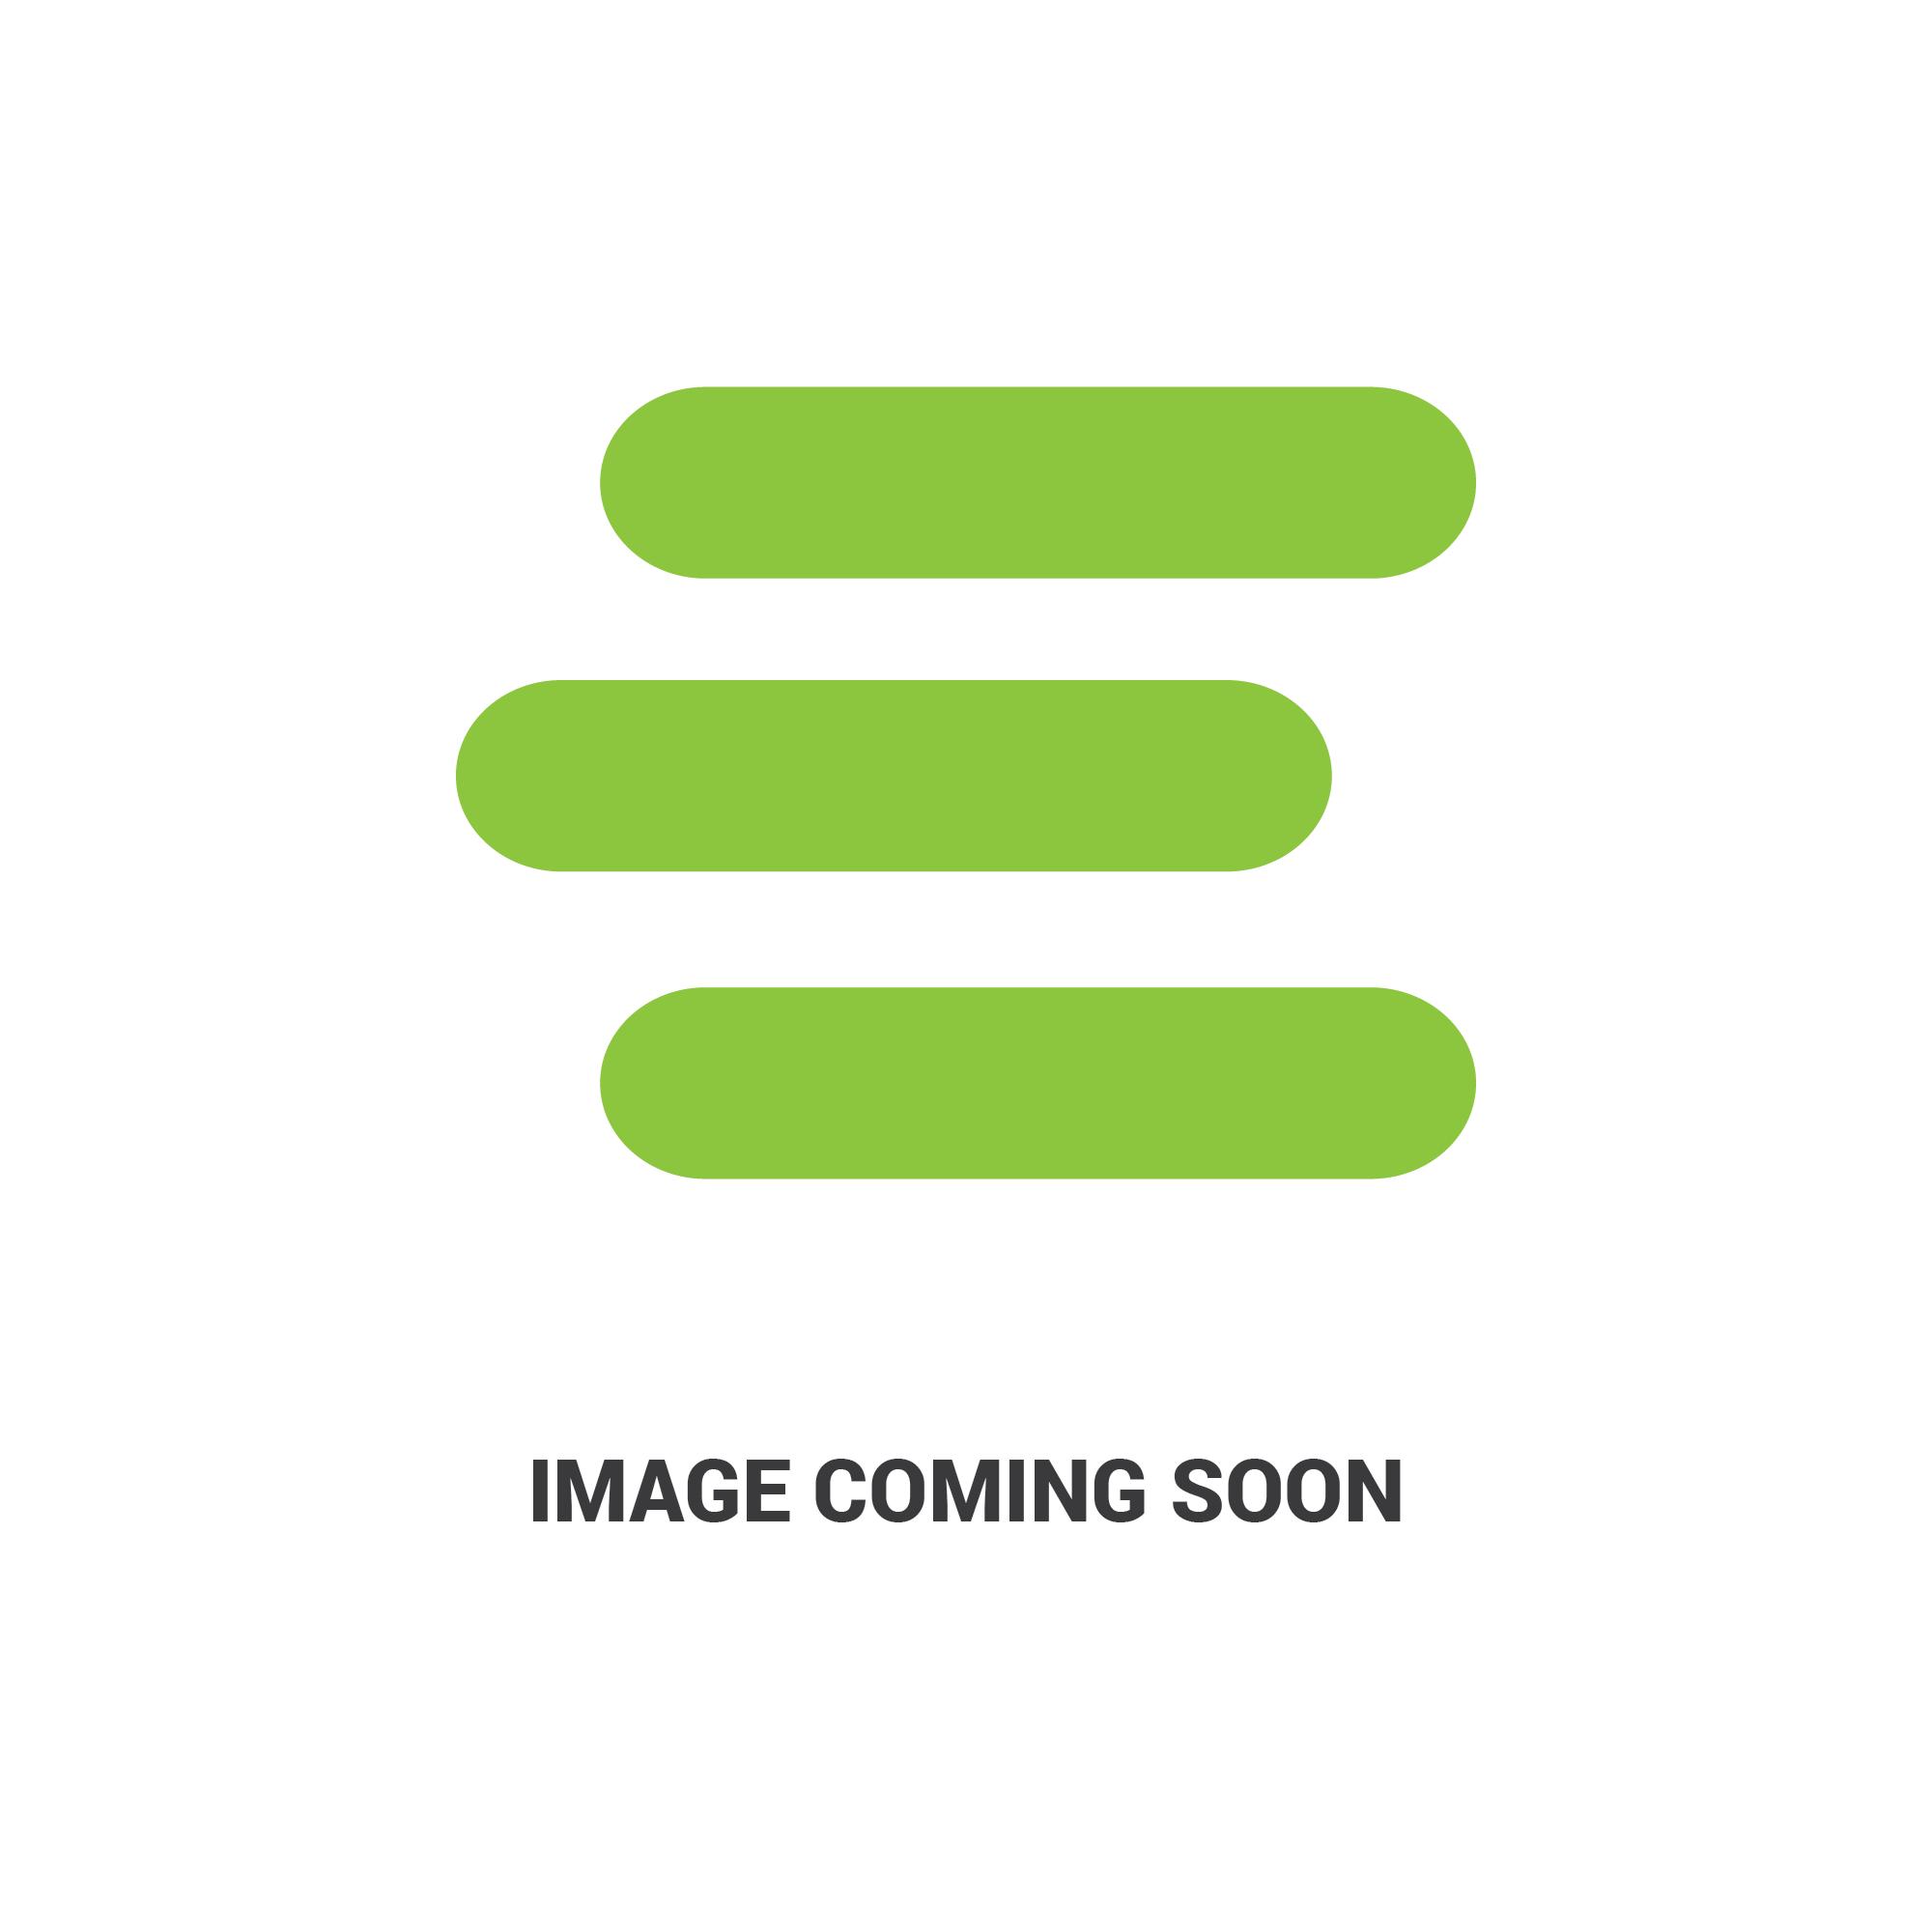 E-70228545edit 1.jpg